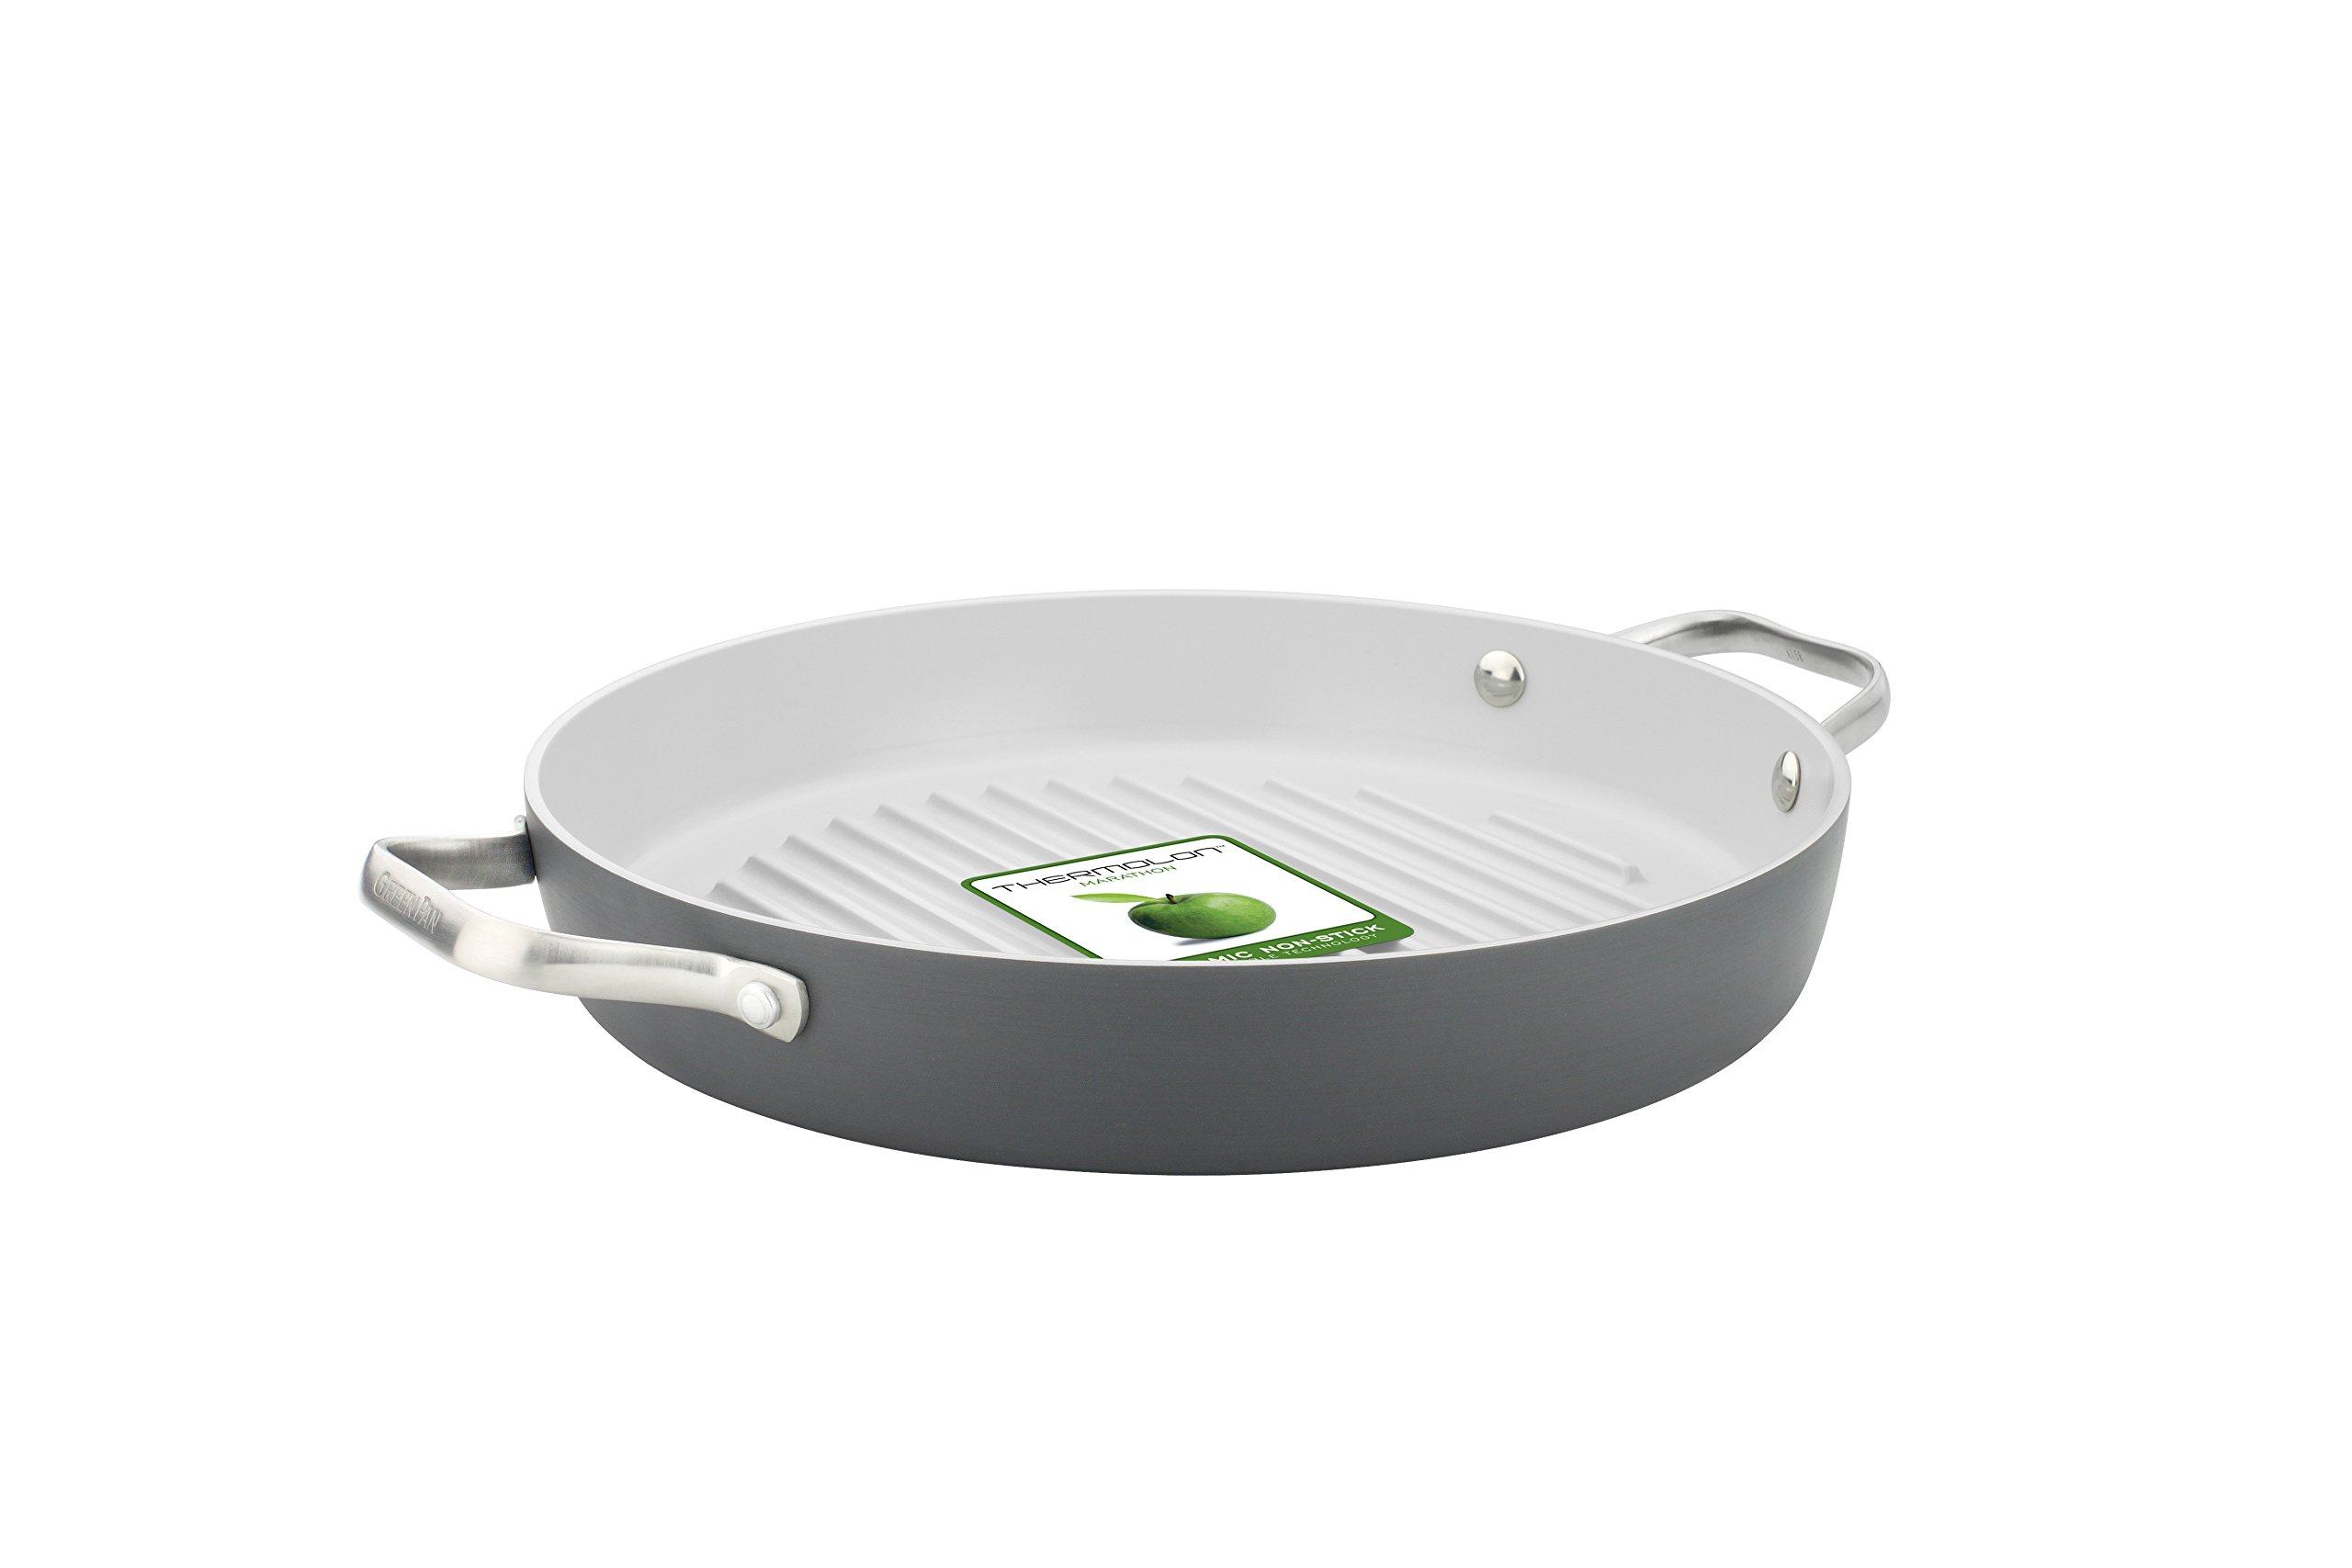 GreenPan Padova 11'' Ceramic Non-Stick Round Grill Pan with 2 Side Handles, Grey